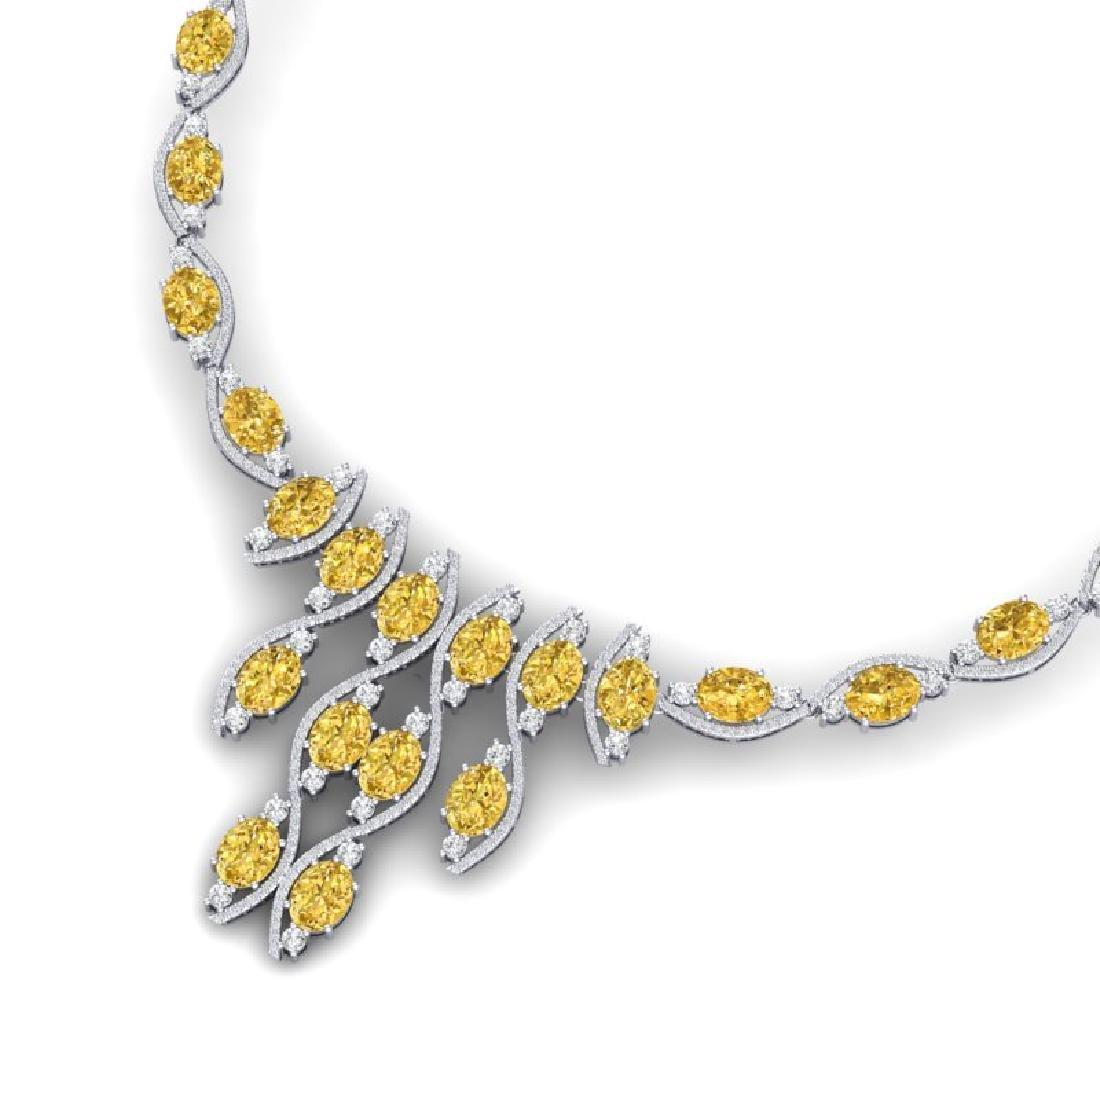 64.04 CTW Royalty Canary Citrine & VS Diamond Necklace